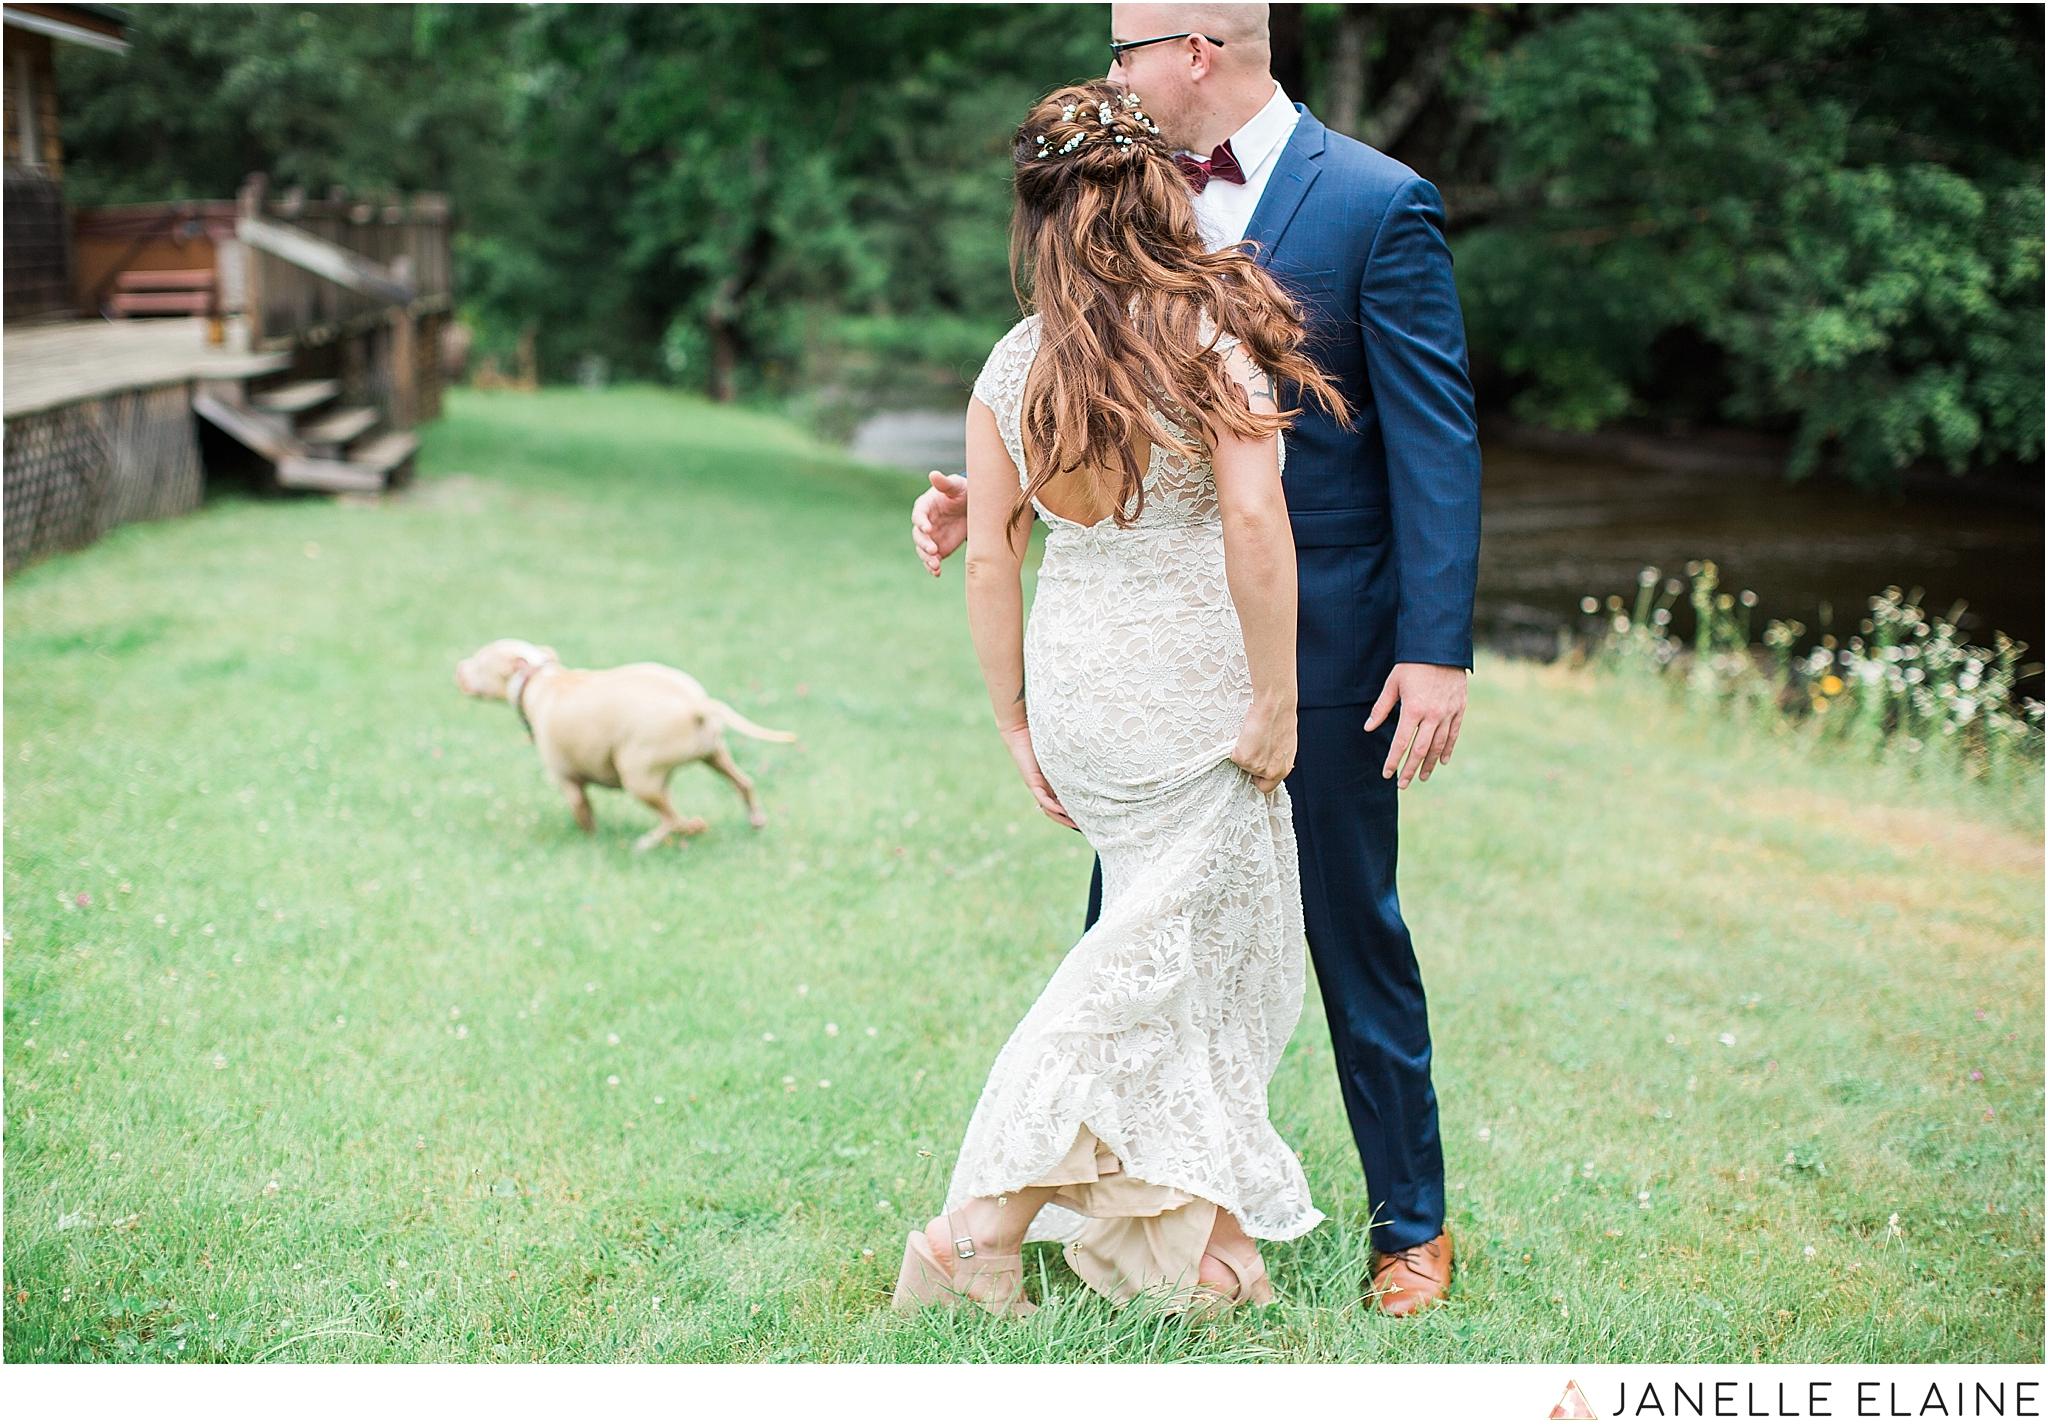 janelle elaine photography-seattle-destination-wedding-photographer-32.jpg